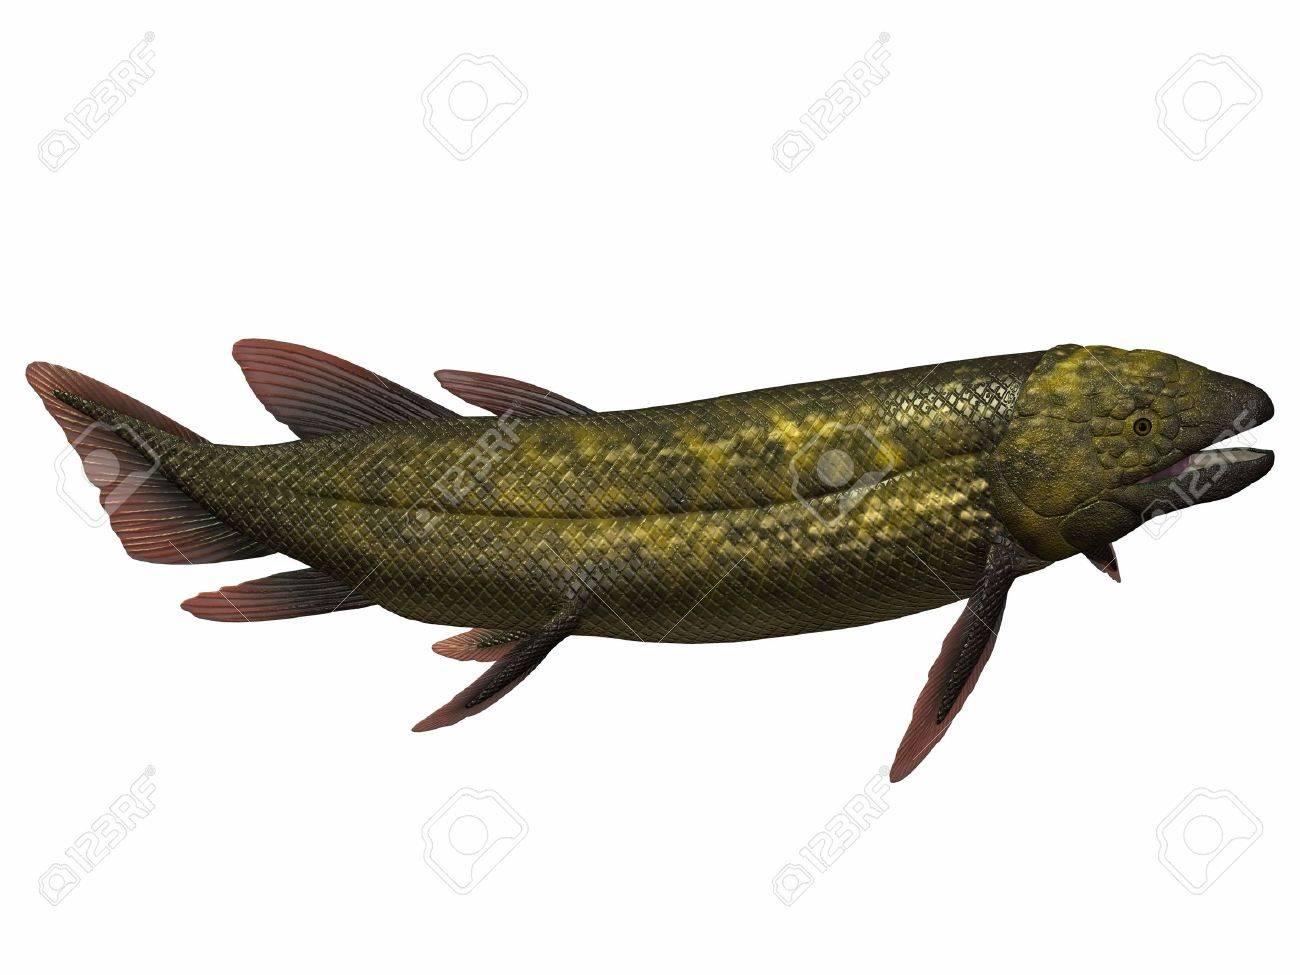 Freshwater fish in australia - Dipterus Fish On White Dipterus Is An Extinct Genus Of Freshwater Lungfish From The Devonian